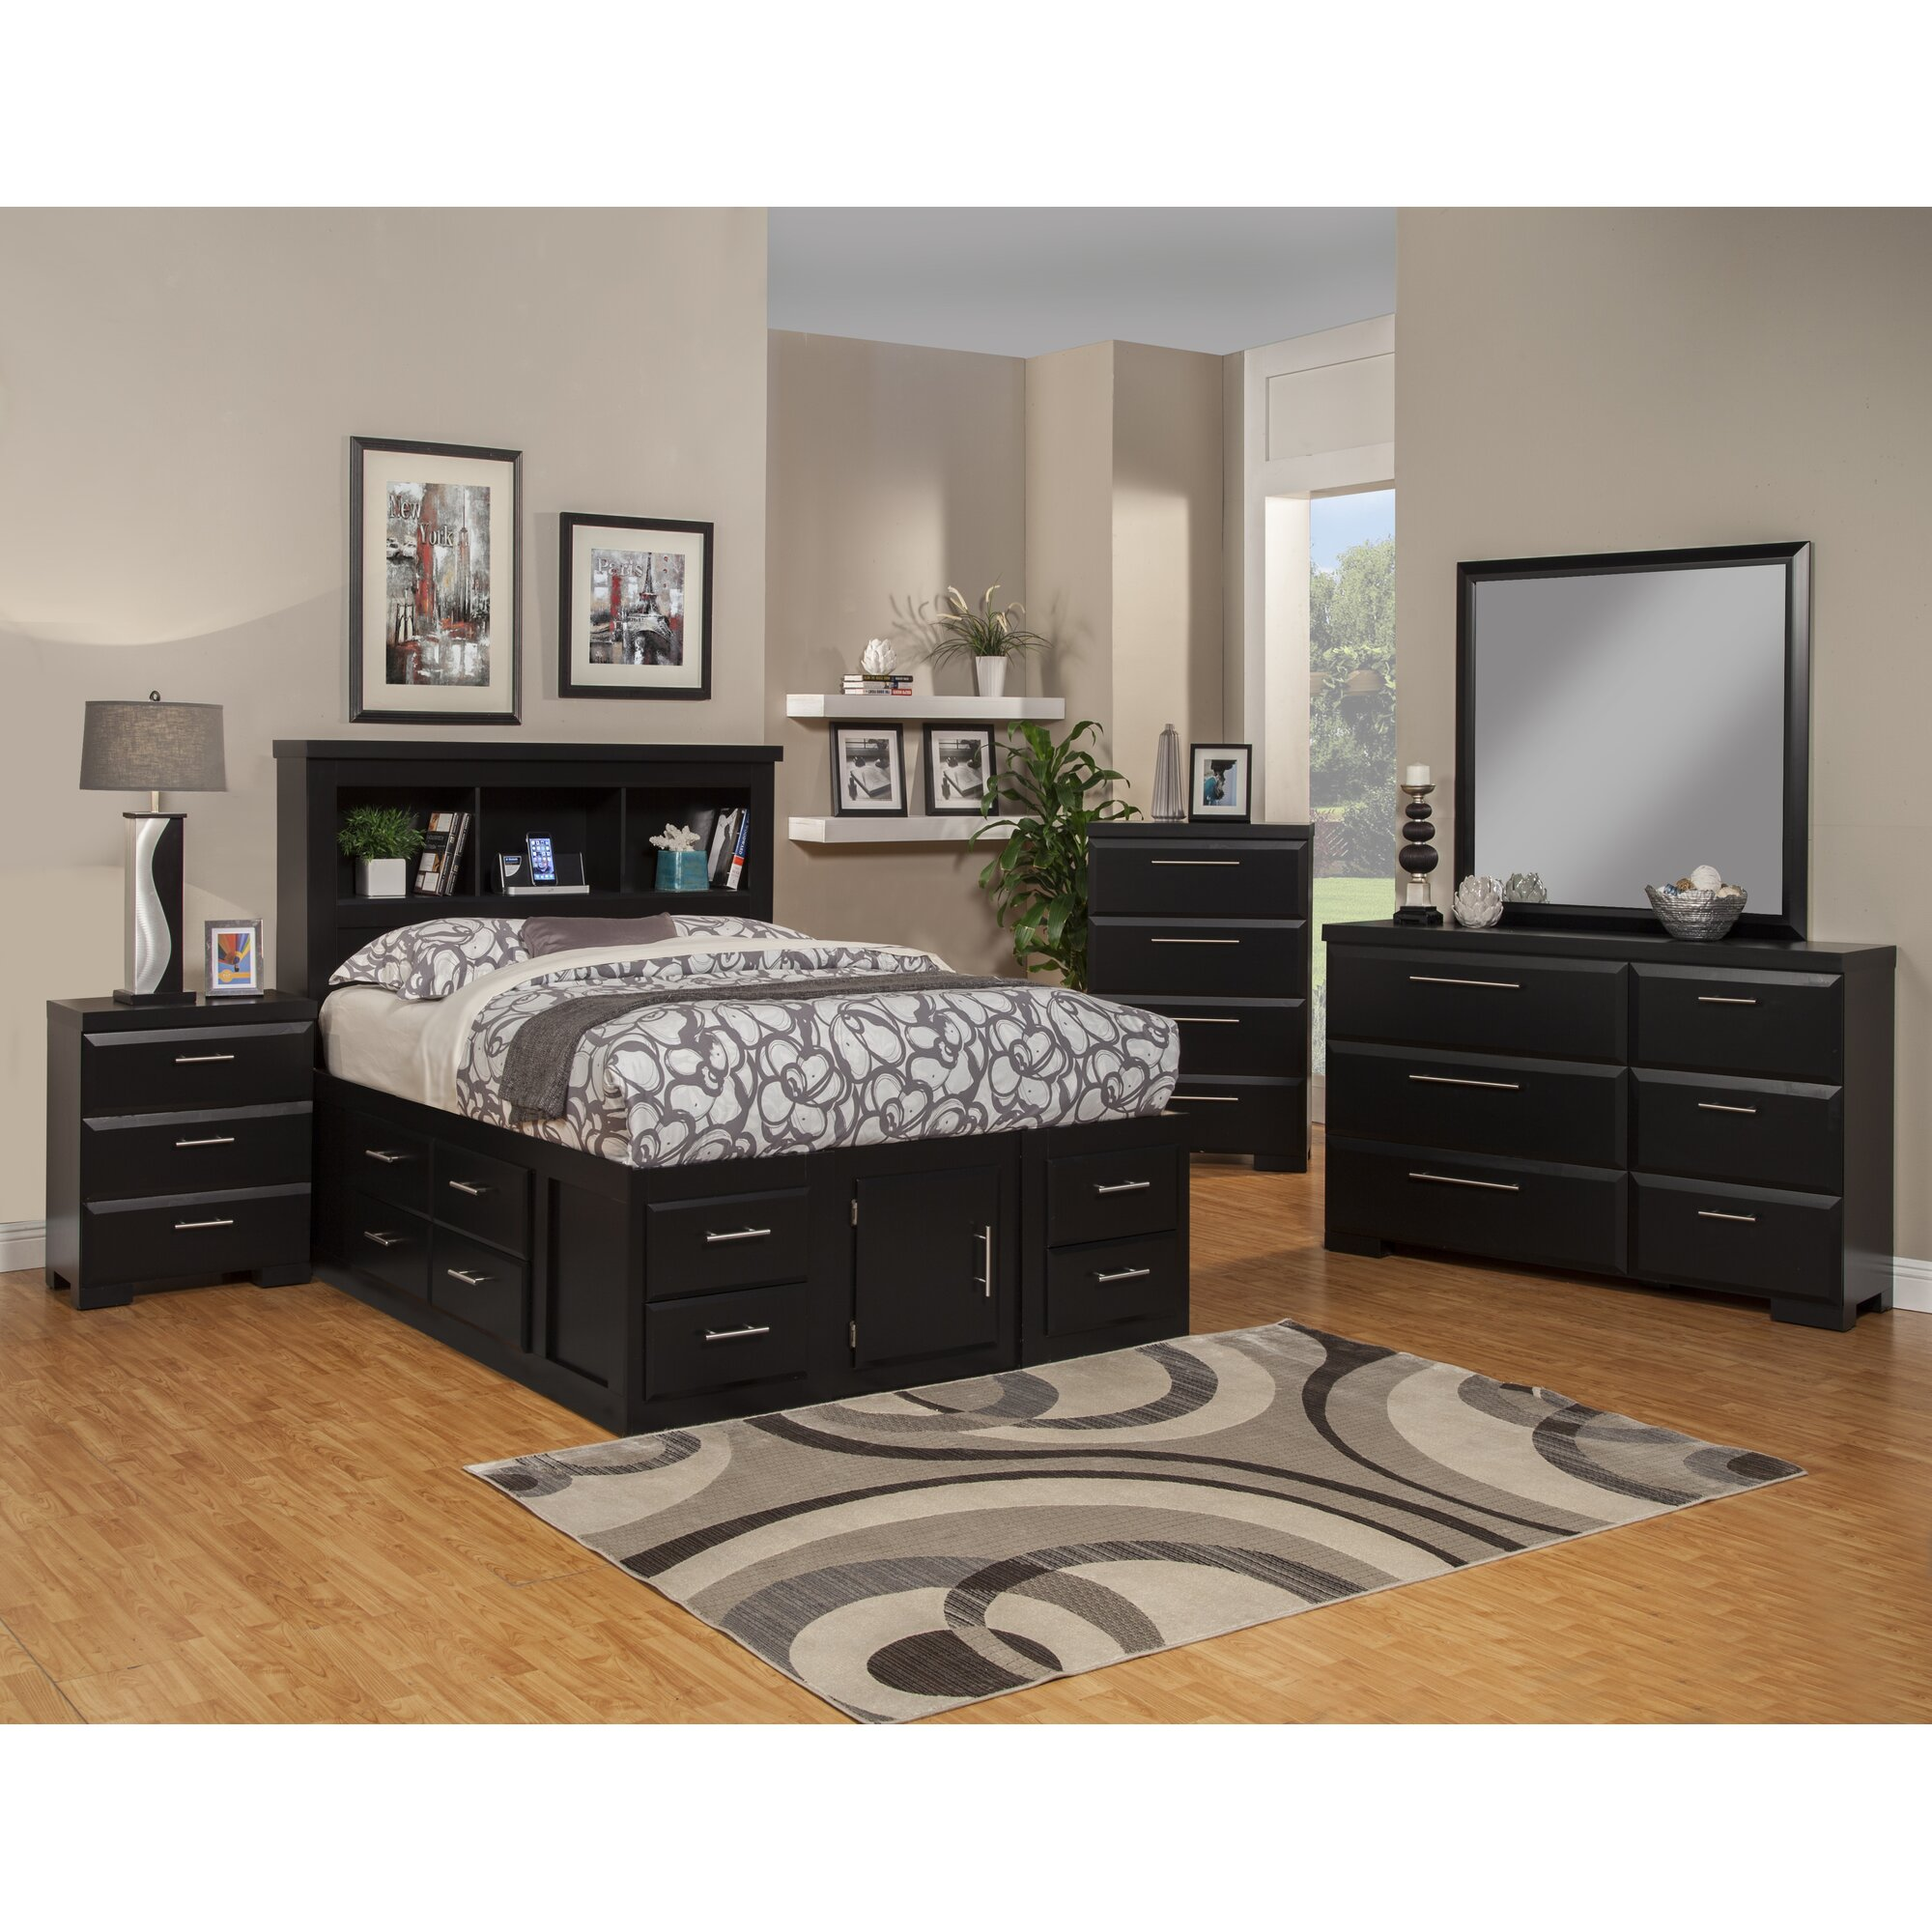 Sandberg Furniture Serenity Platform Customizable Bedroom Set